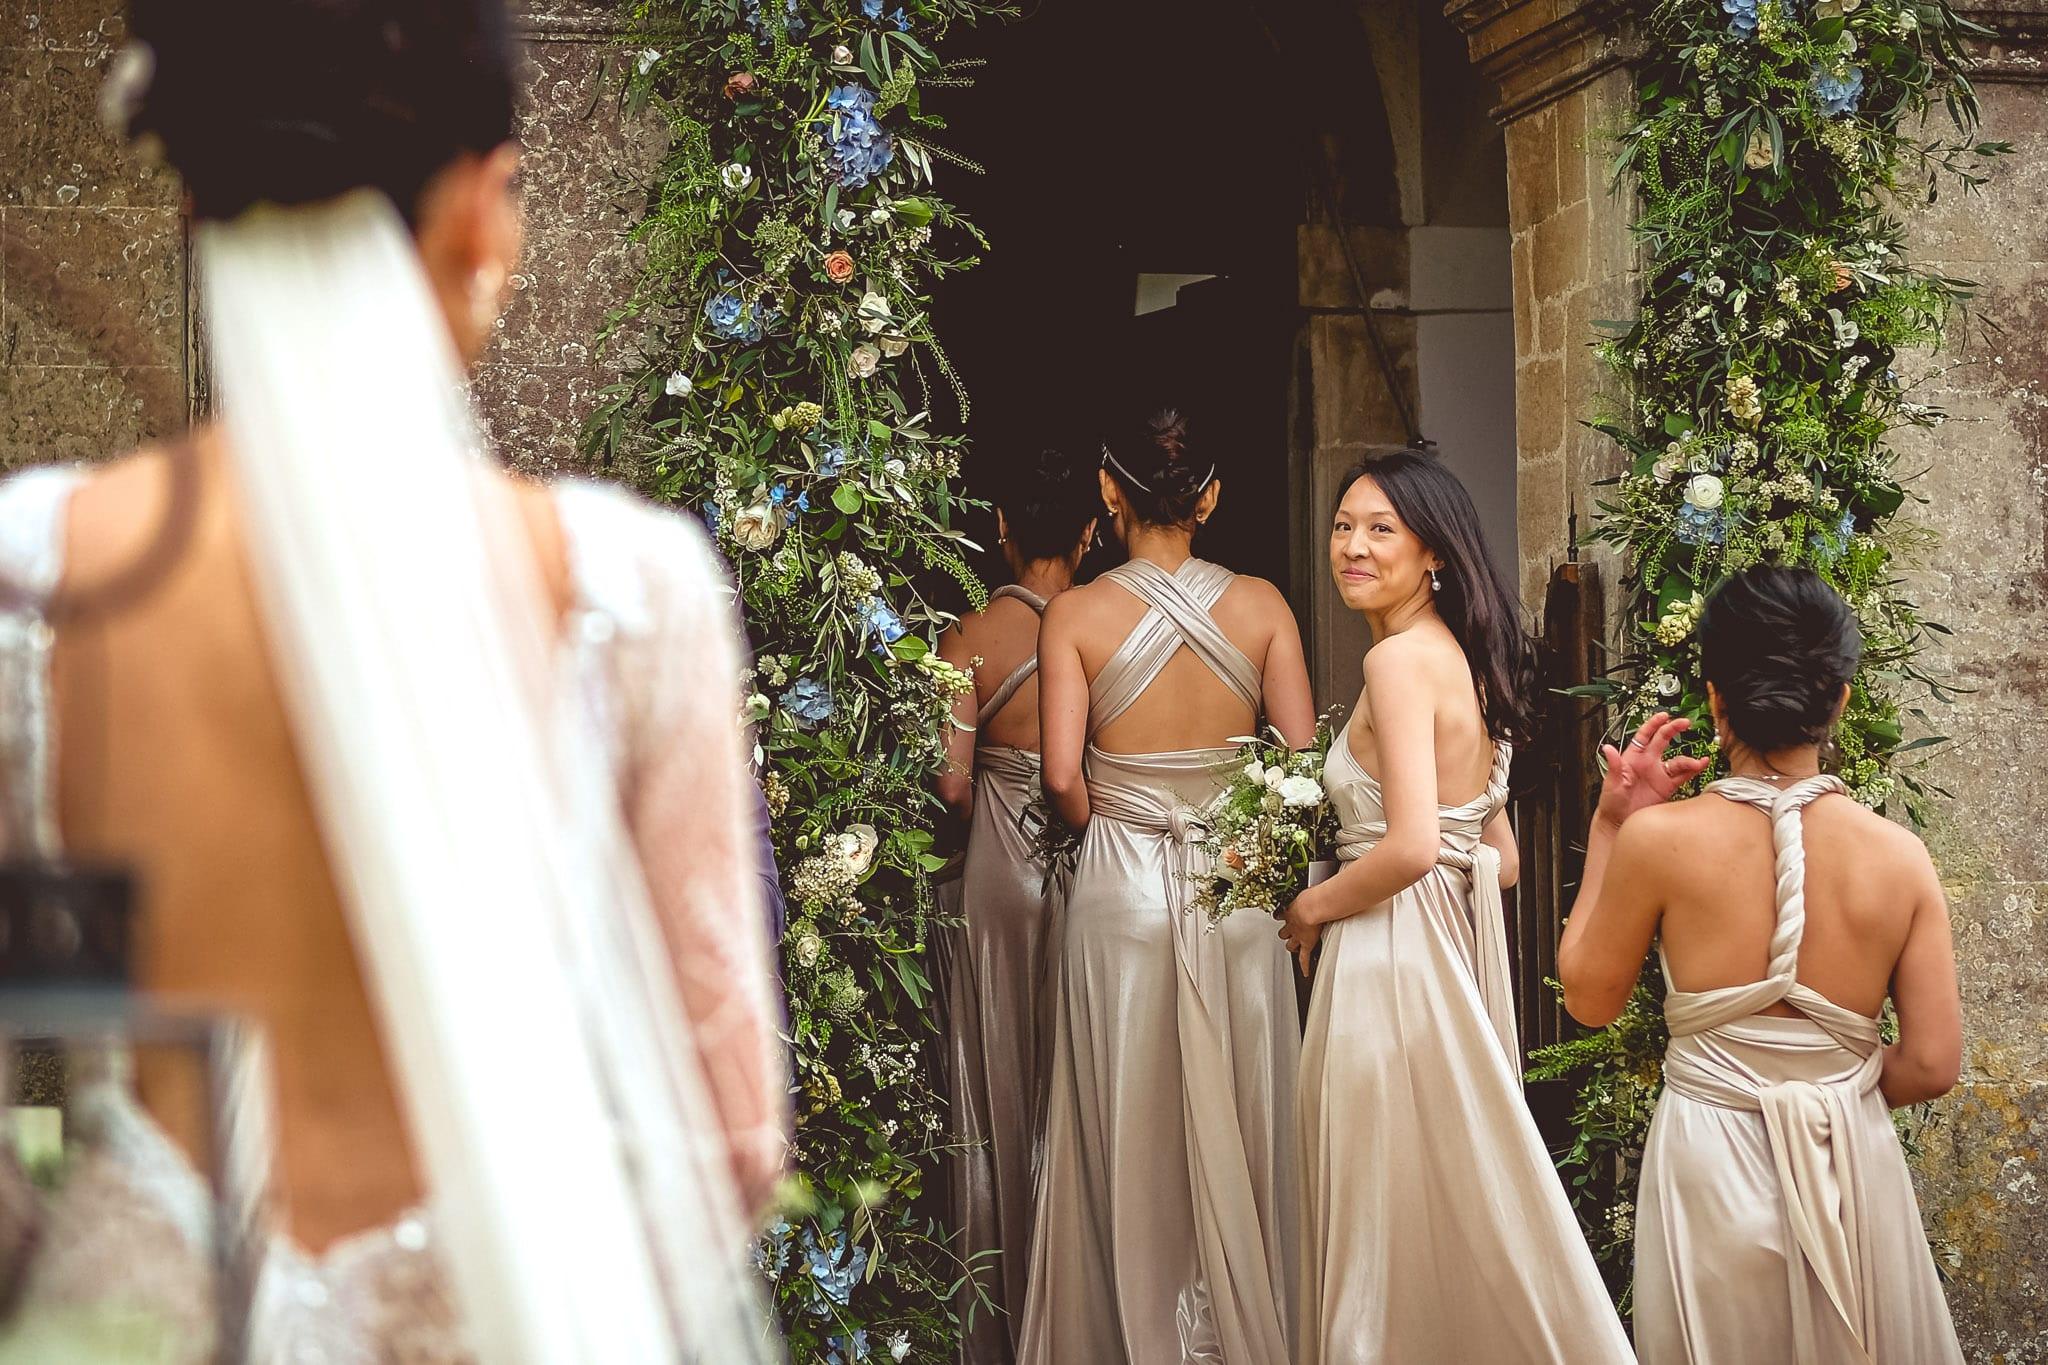 Bride and bridesmaids waiting to enter the church at a Babington House wedding in Somerset